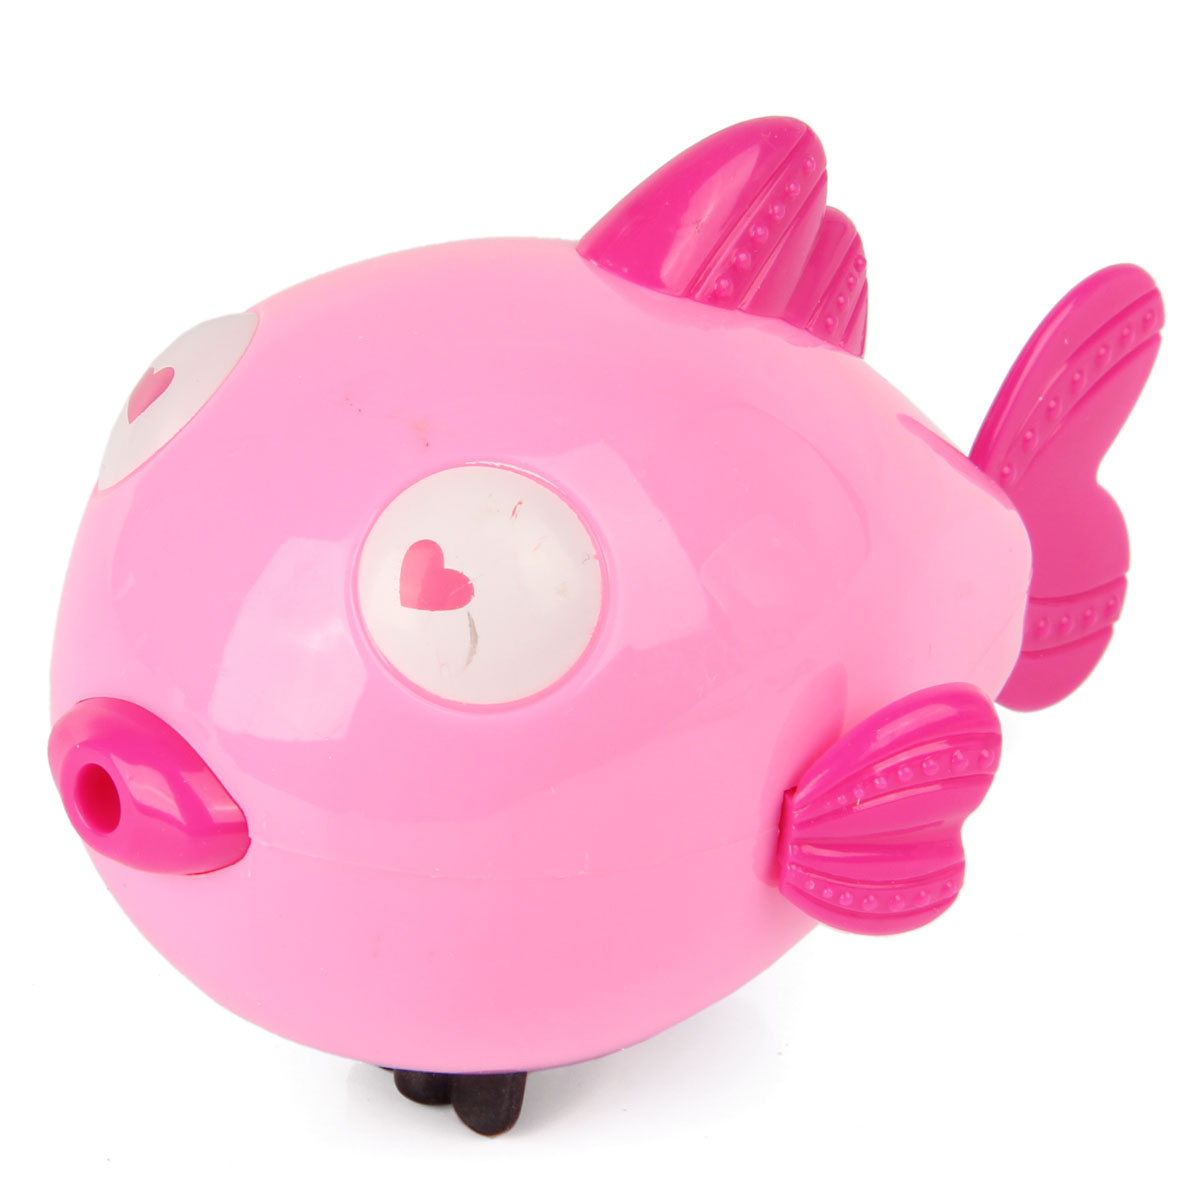 Игрушки для ванны Ути Пути Рыбка цена